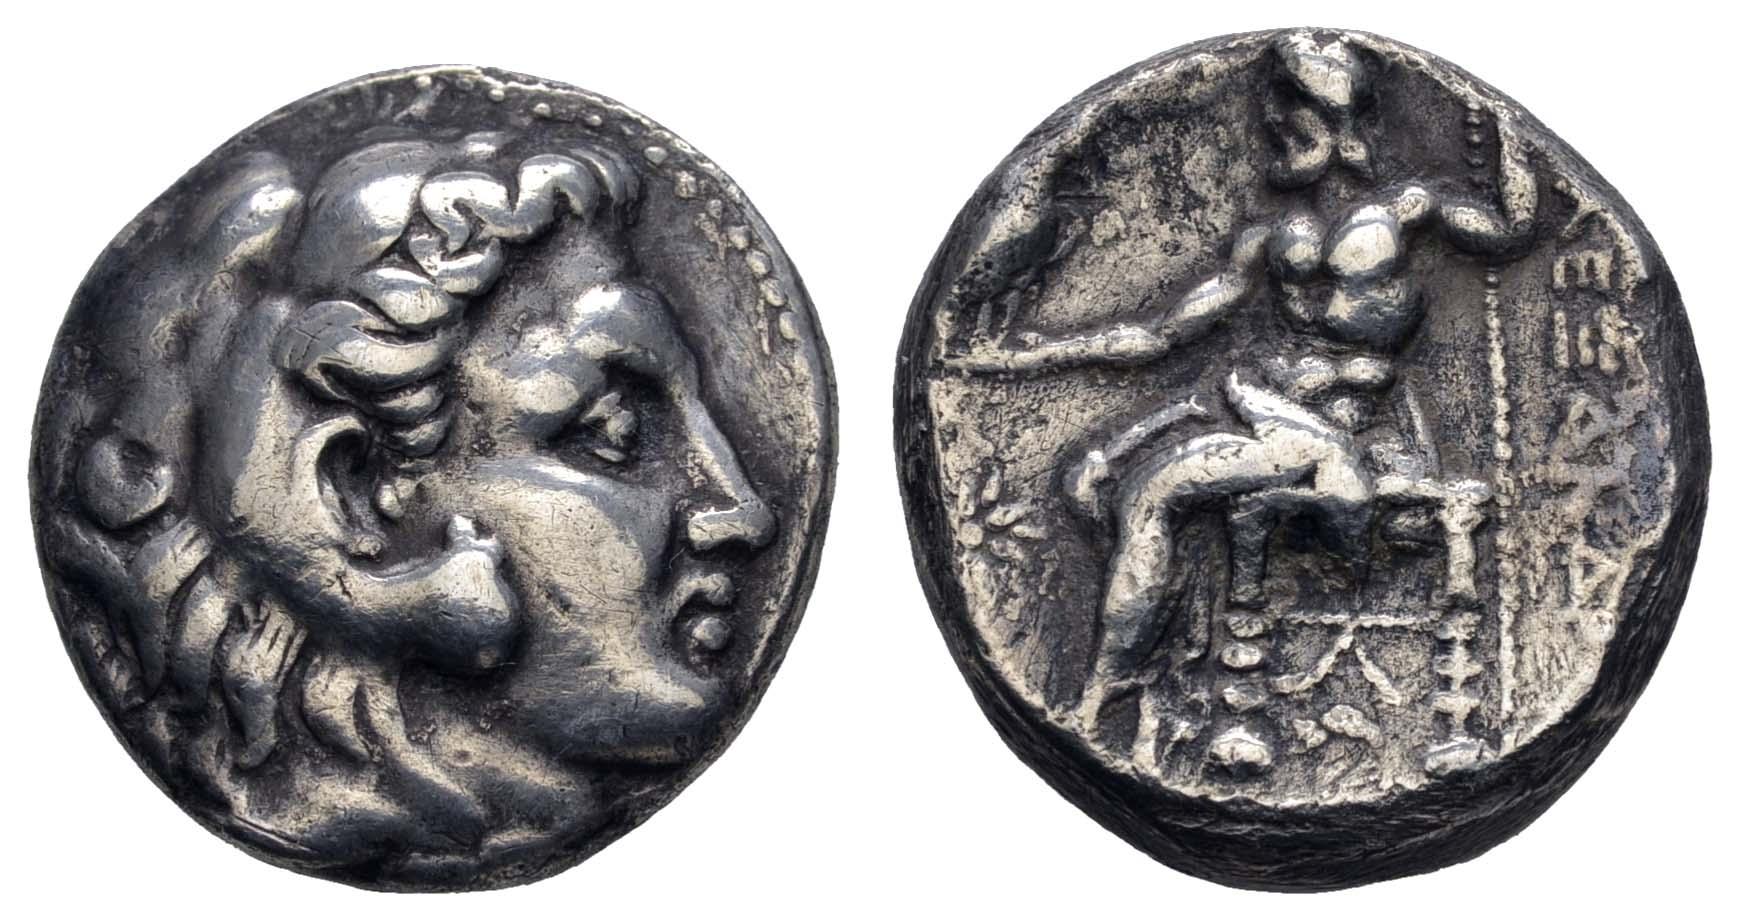 Lot 26 - Antike Griechen - Macedonia -  Auktionshaus Ulrich Felzmann GmbH & Co. KG Coins single lots